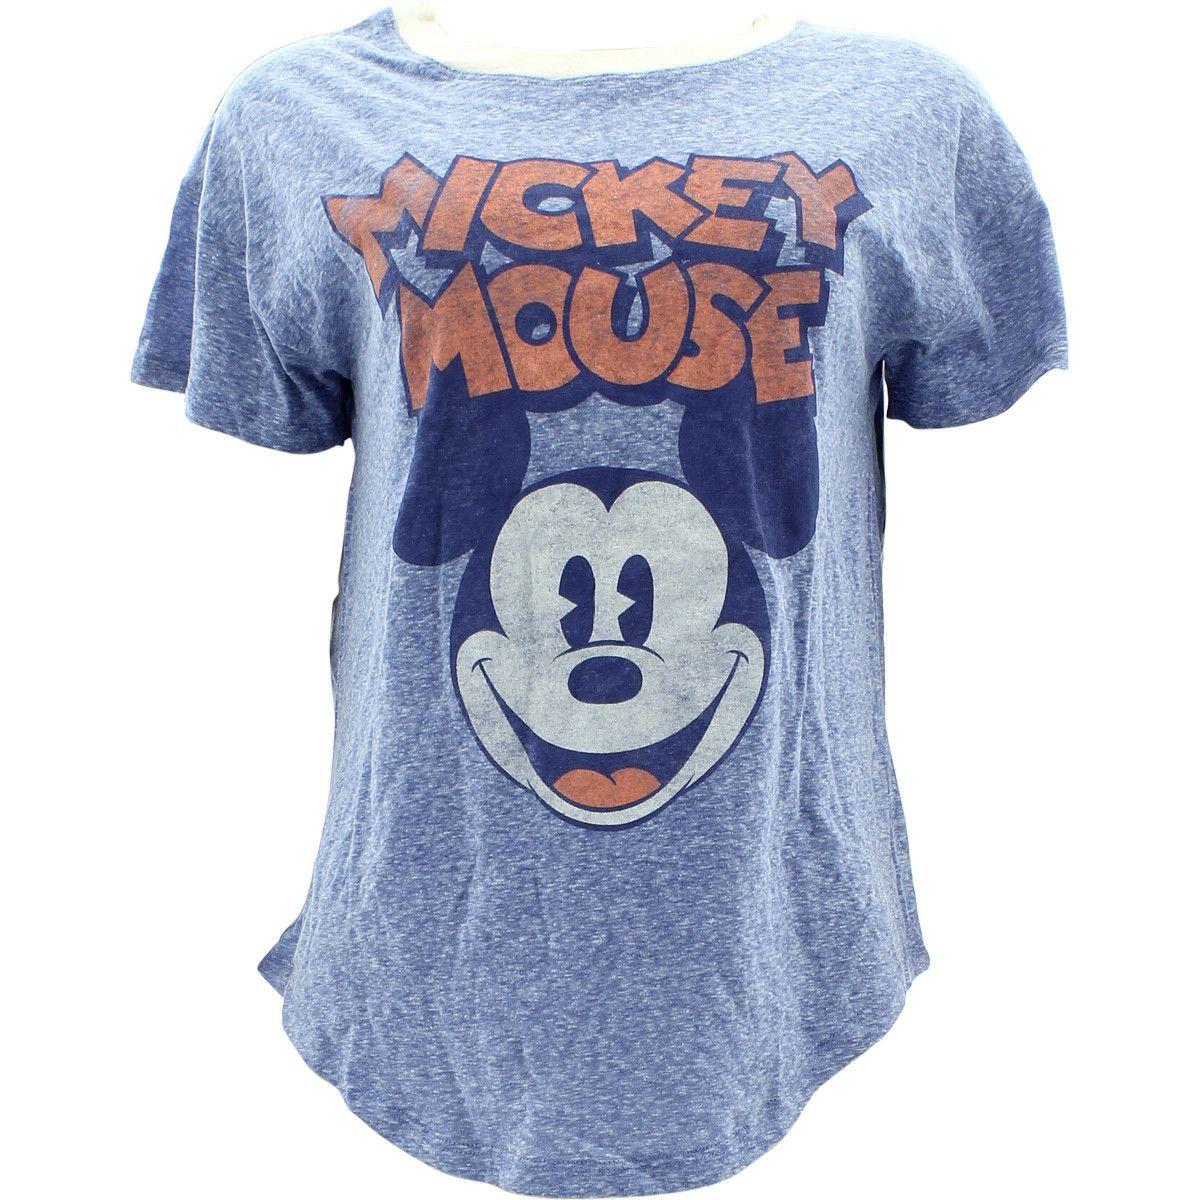 cd98e550 Disney - Women's Mickey Mouse Face T-Shirts - Blue | disney stuff ...